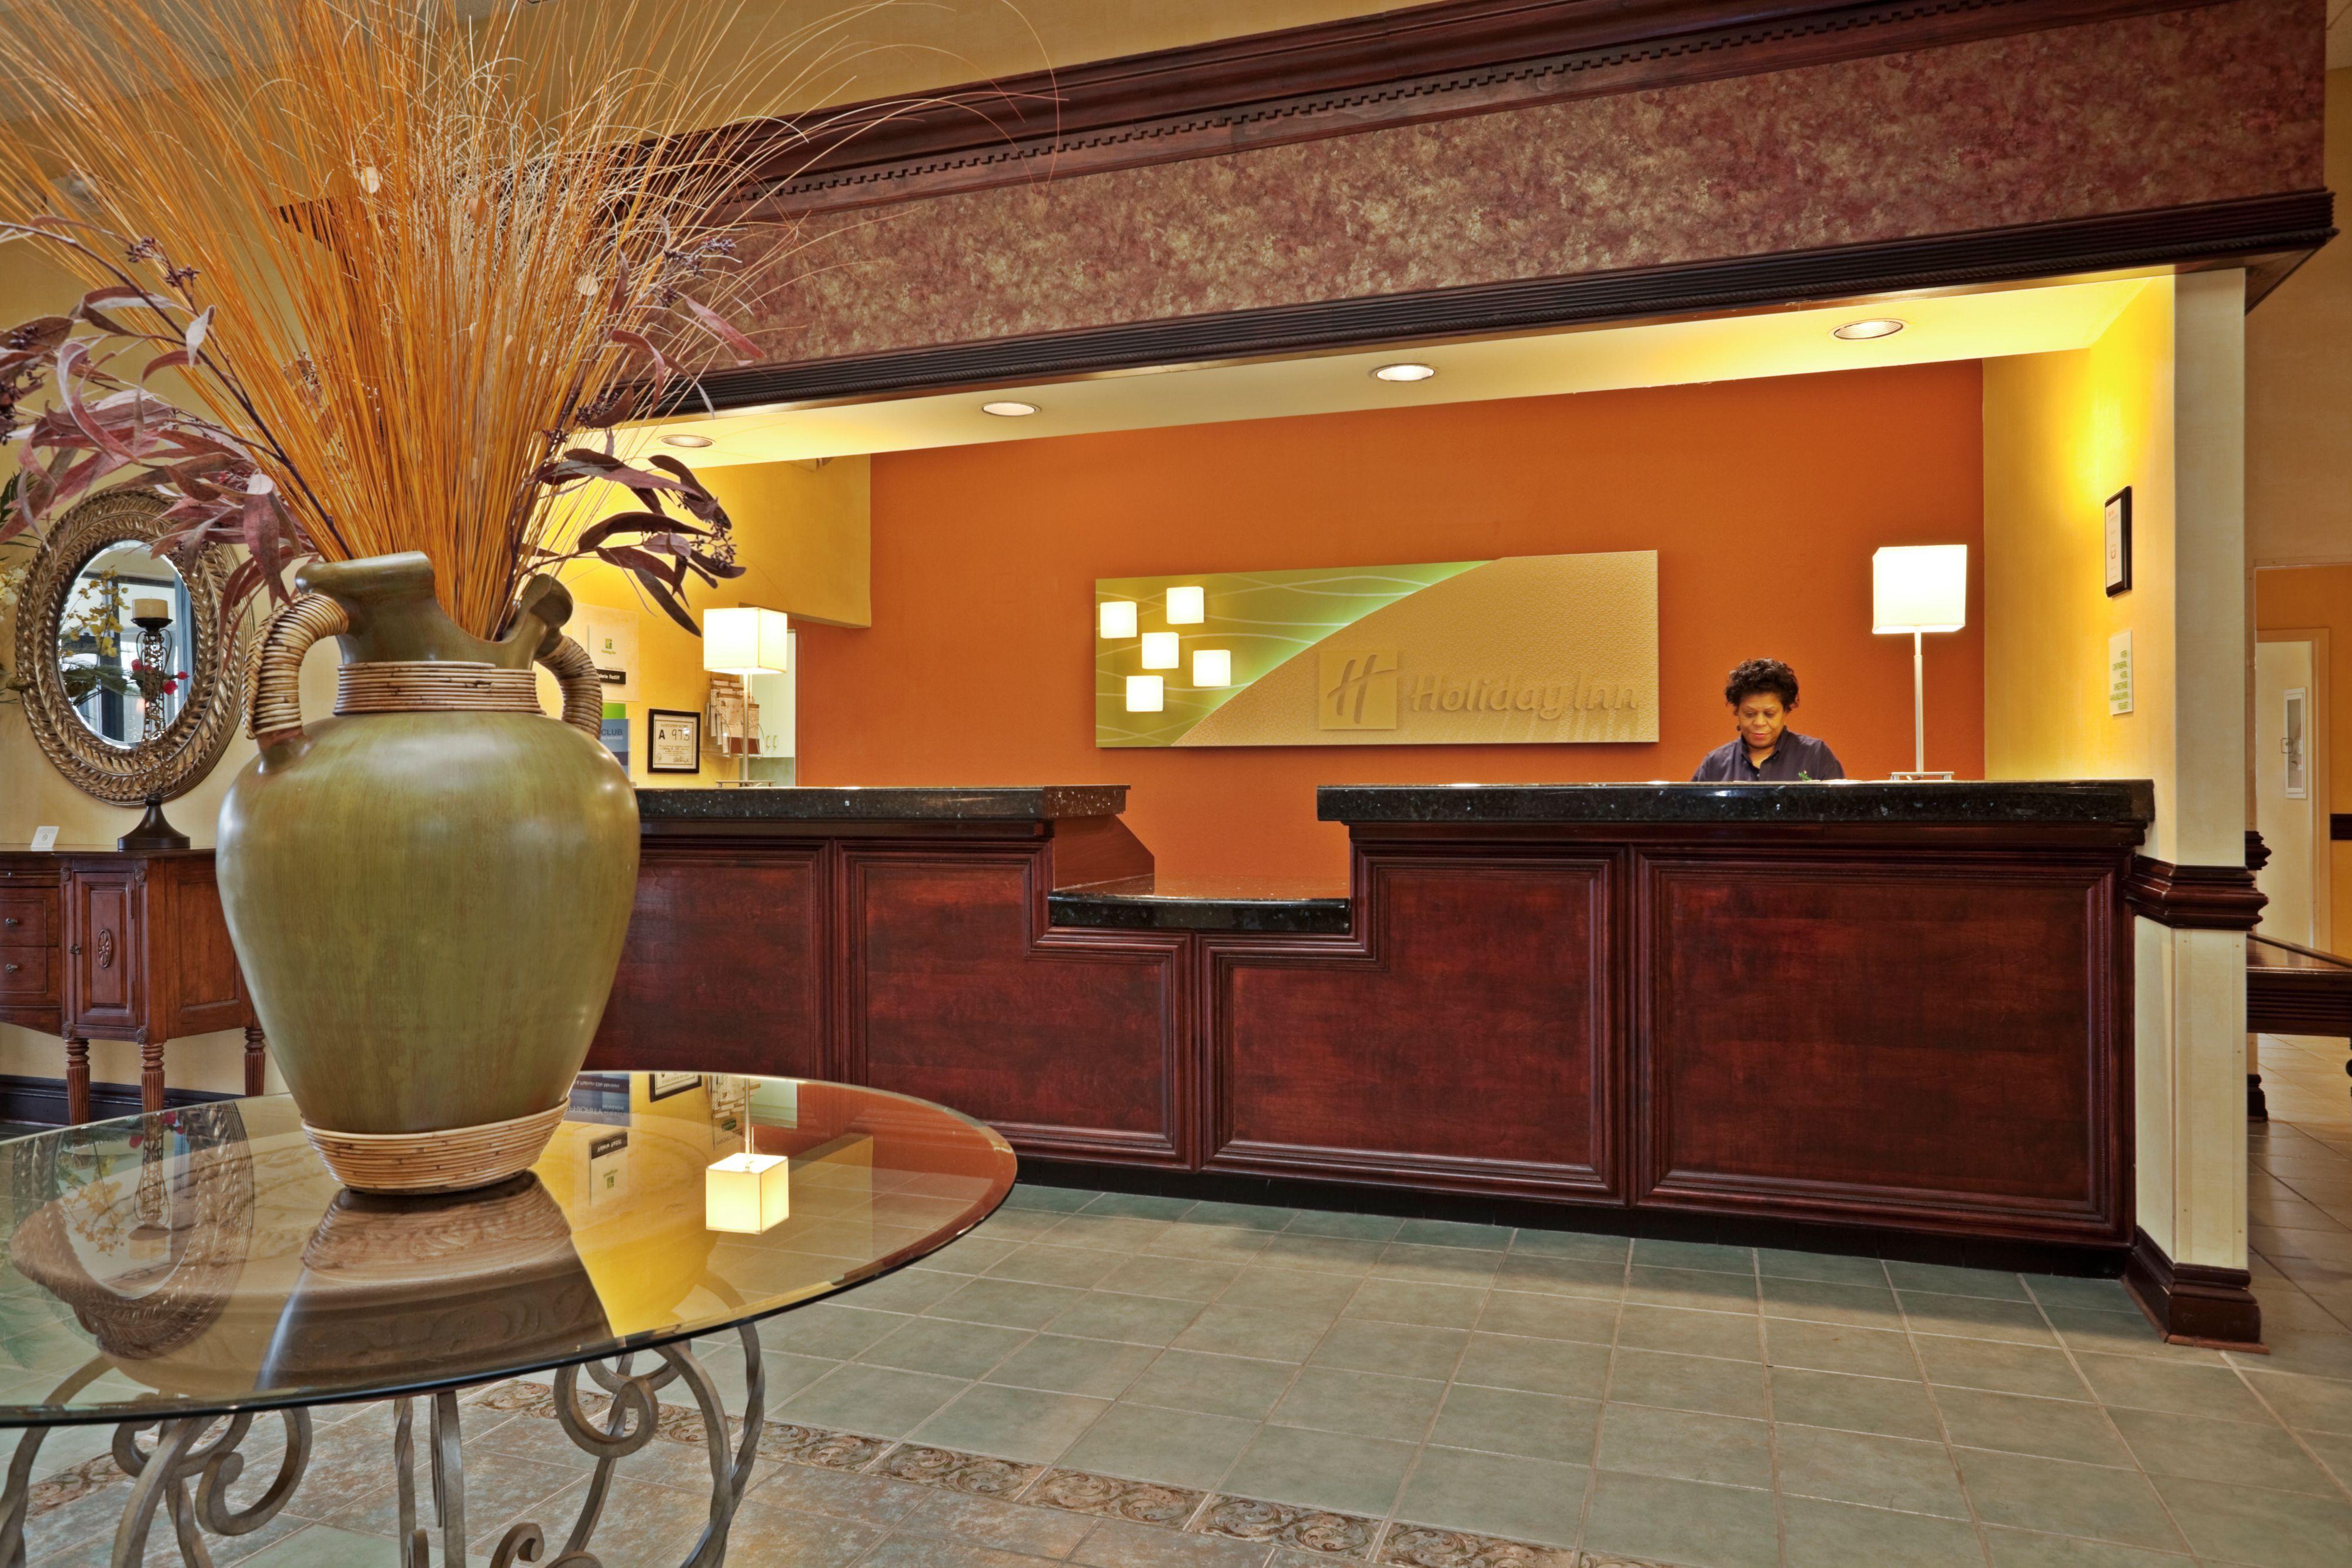 Holiday Inn Lumberton North - I-95 image 3